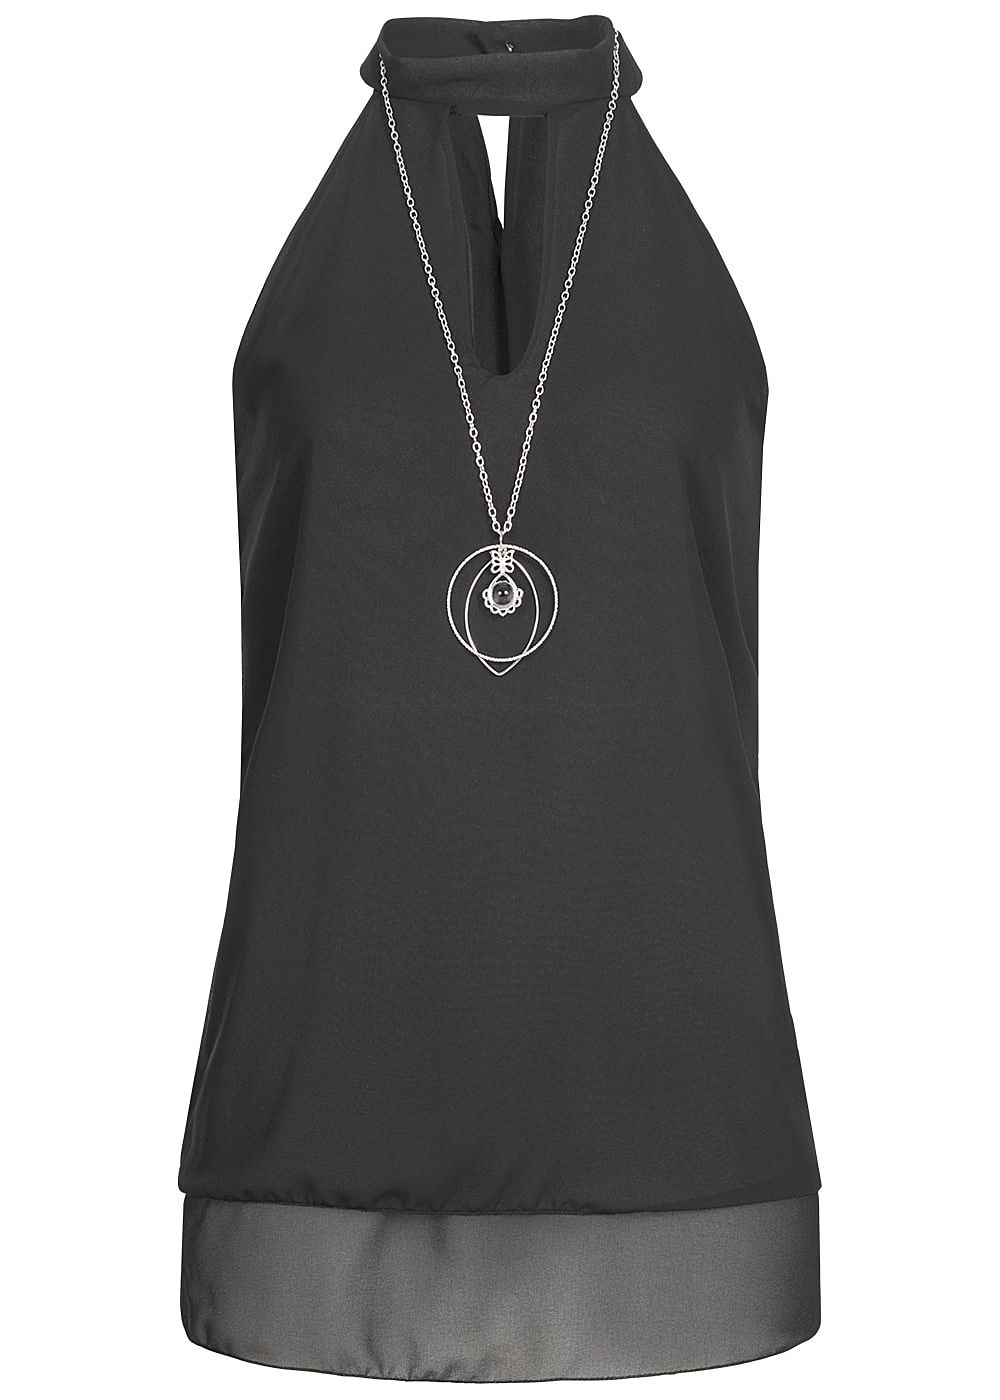 styleboom fashion damen chiffon top 2 lagig mit kette neckholder schwarz 77onlineshop. Black Bedroom Furniture Sets. Home Design Ideas